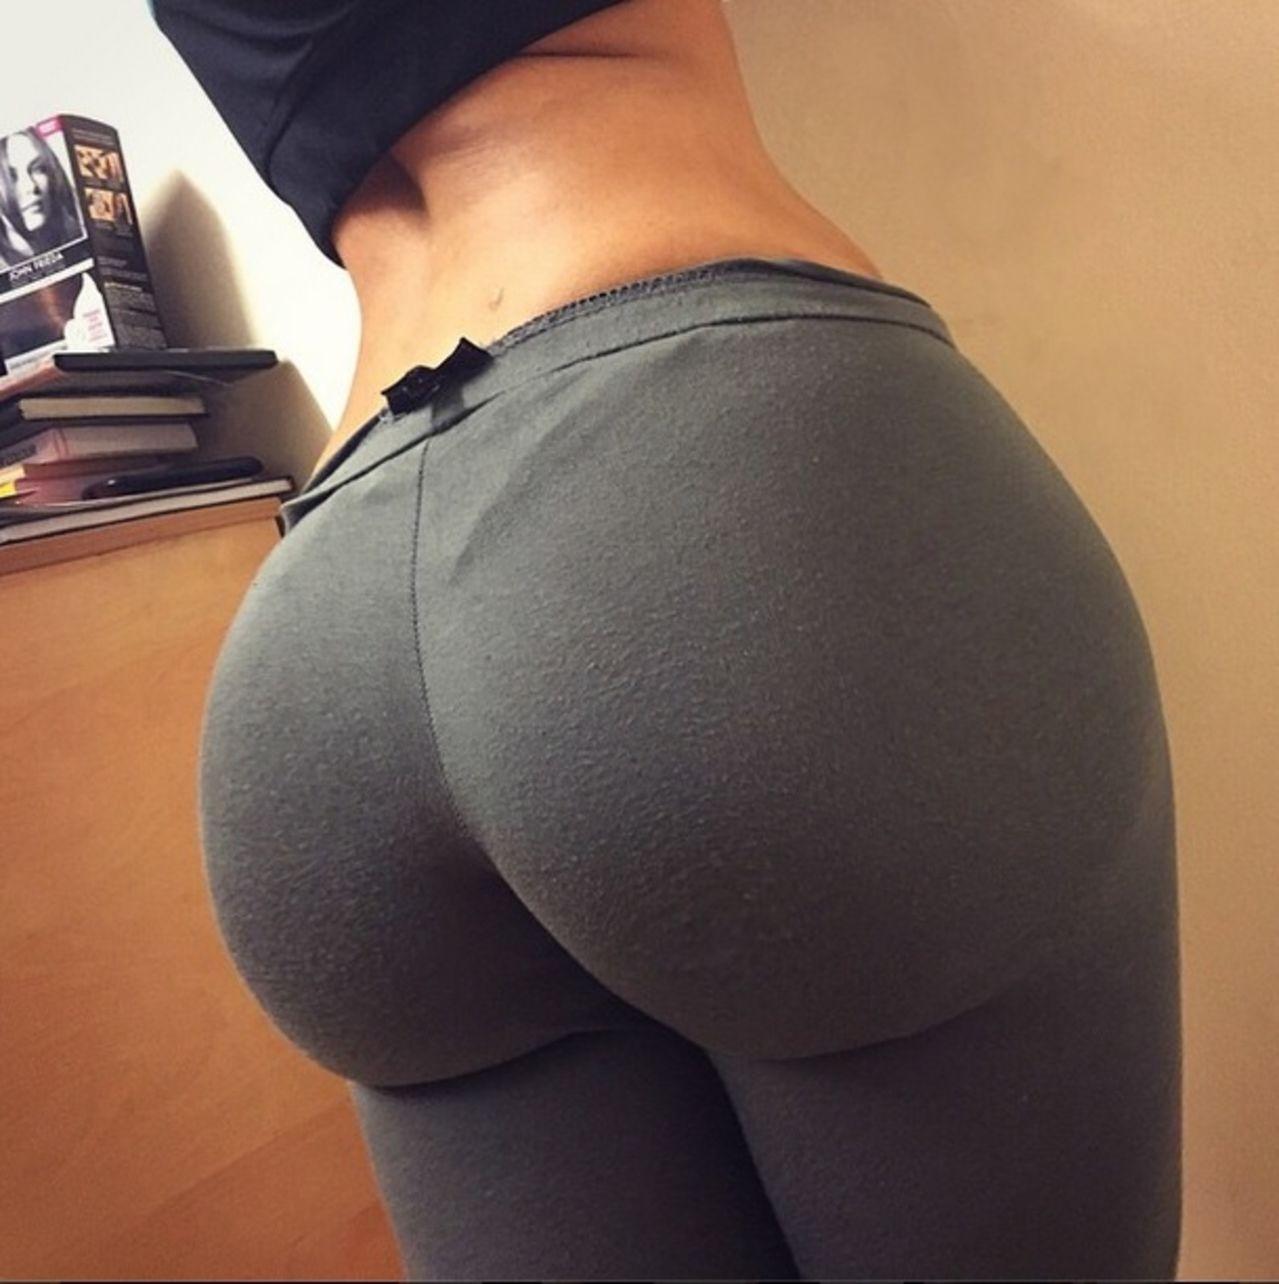 hot buddha bang exvid free sex videos #leggings #whiteleggings #yogapants #spandexass #spandexass #bigass #pawg #whooty #bigbooty #booty #ass #slut #perfectass #seethrough #sexy